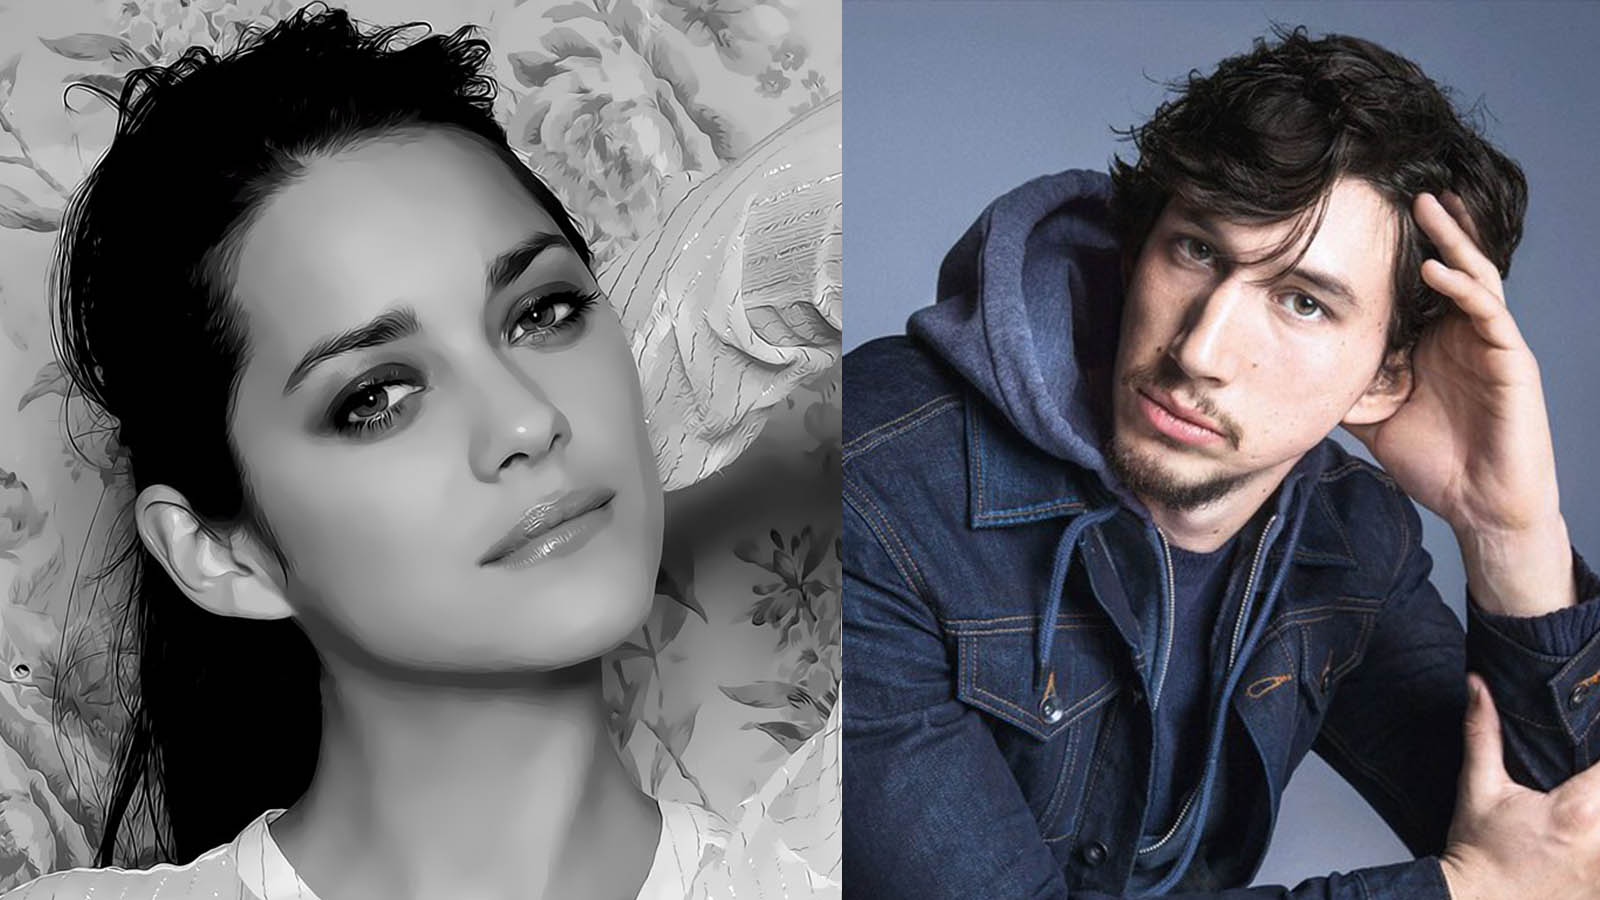 Adam Driver & Marion Cotillard New Movie 'Annette' Coming in 2020 -  Dankanator